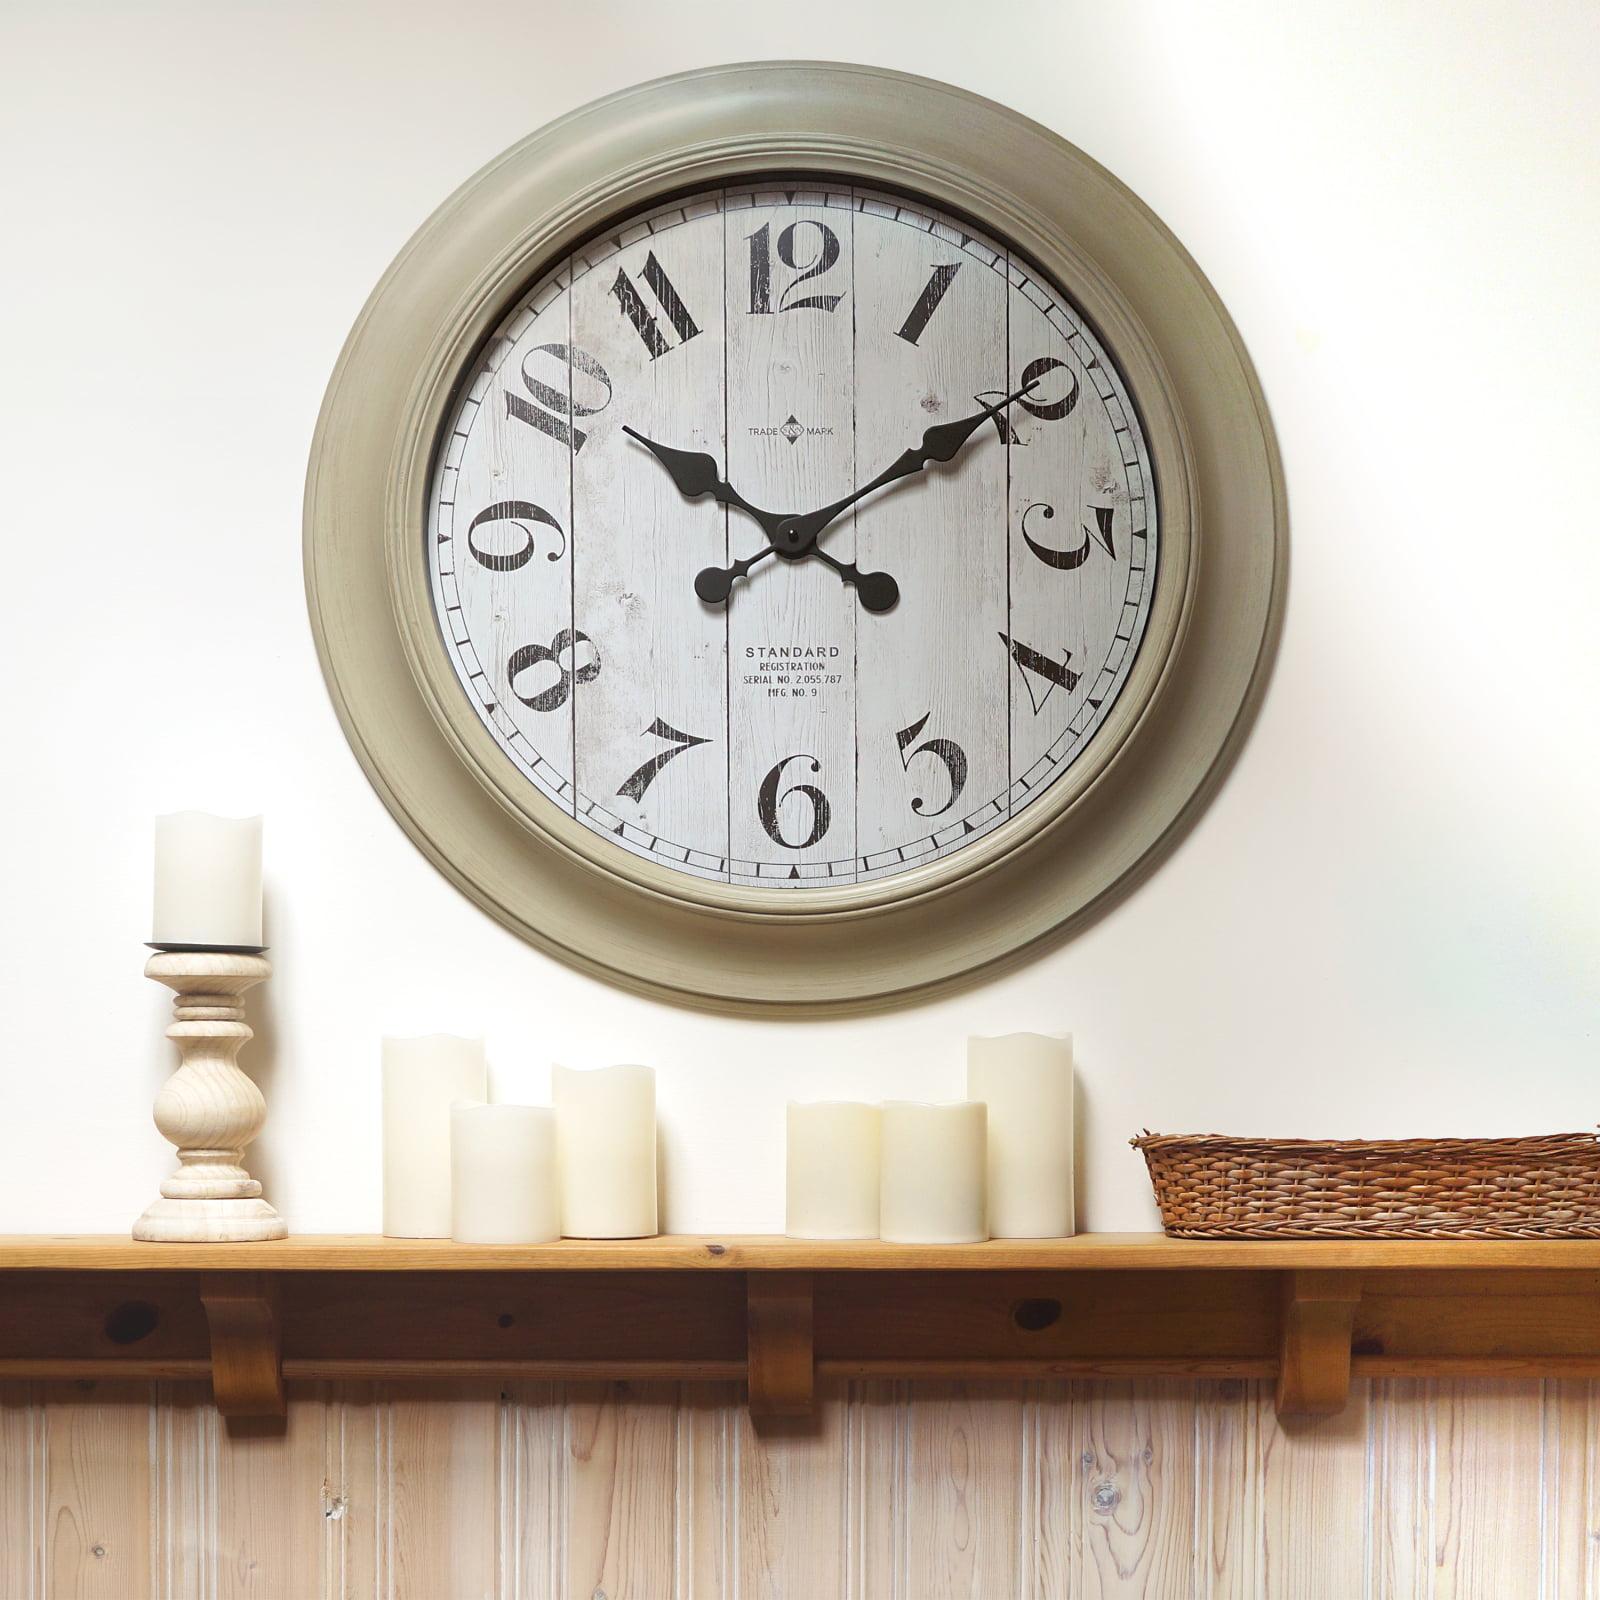 6693944bd075 Better Home & Gardens Oversized Wall Clock, 28 Inch Whitewashed Modern  Farmhouse - Walmart.com